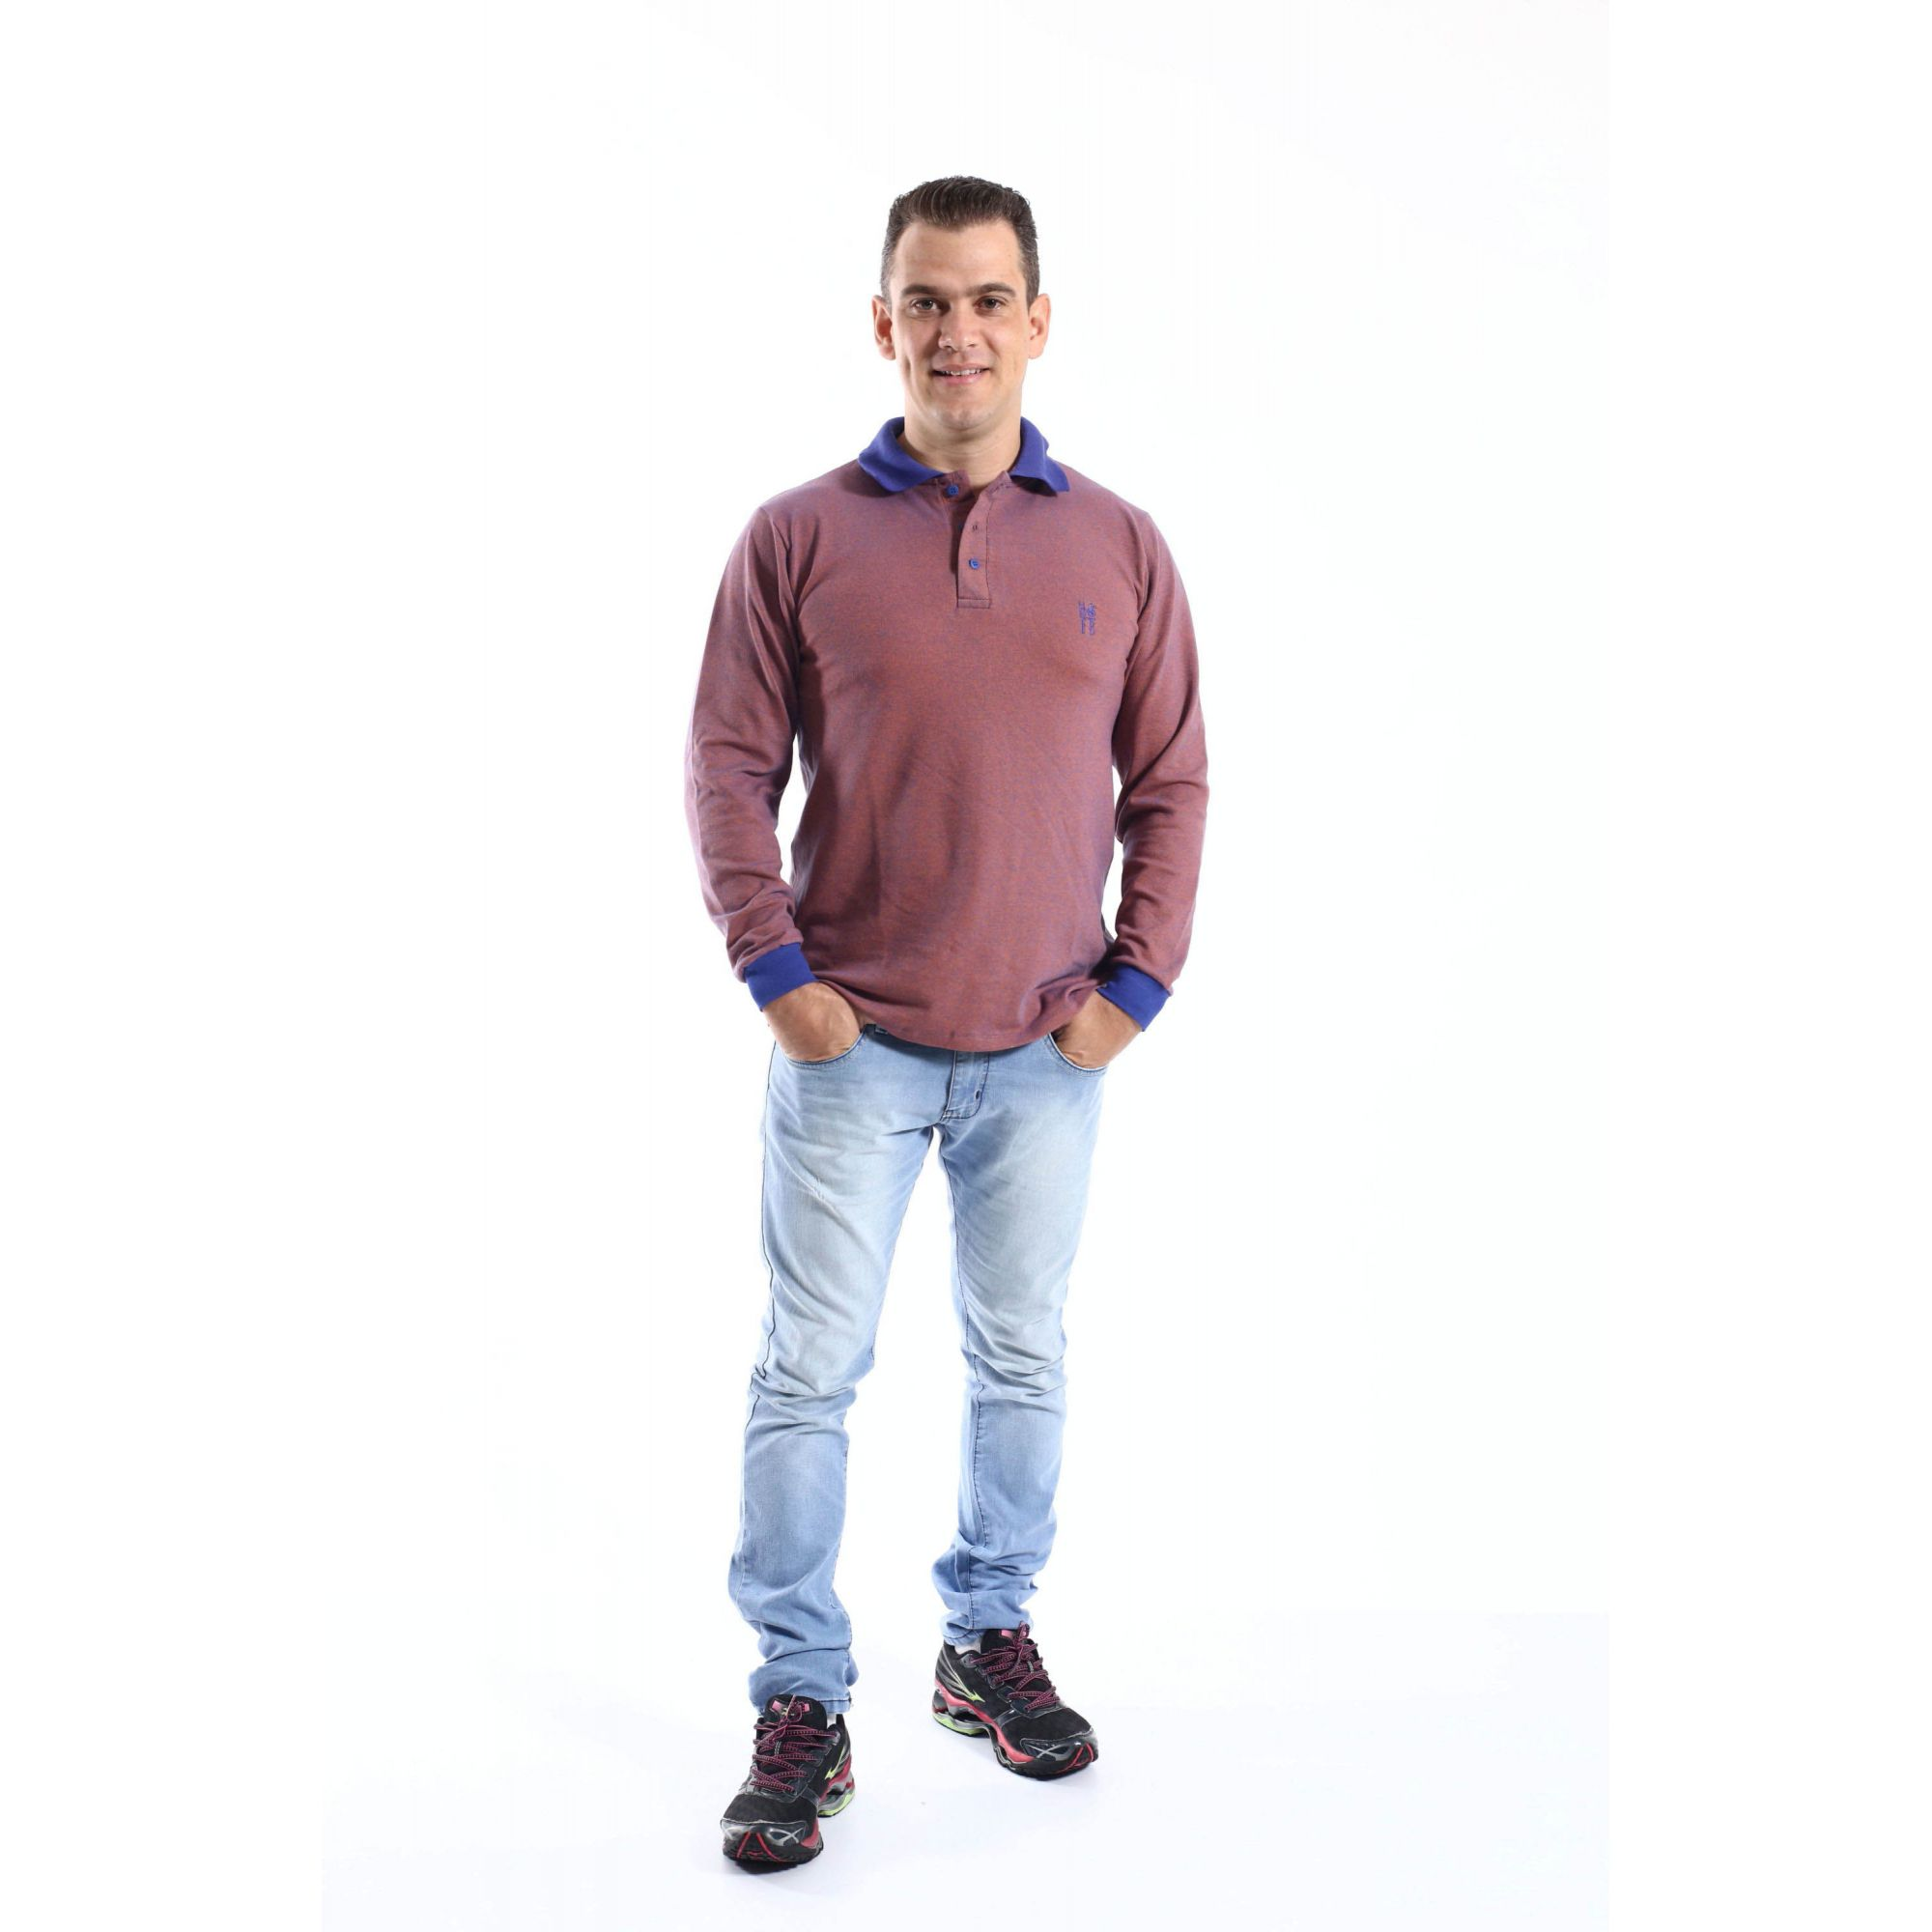 Camisa Polo Laranja Manga Longa  - Heitor Fashion Brazil